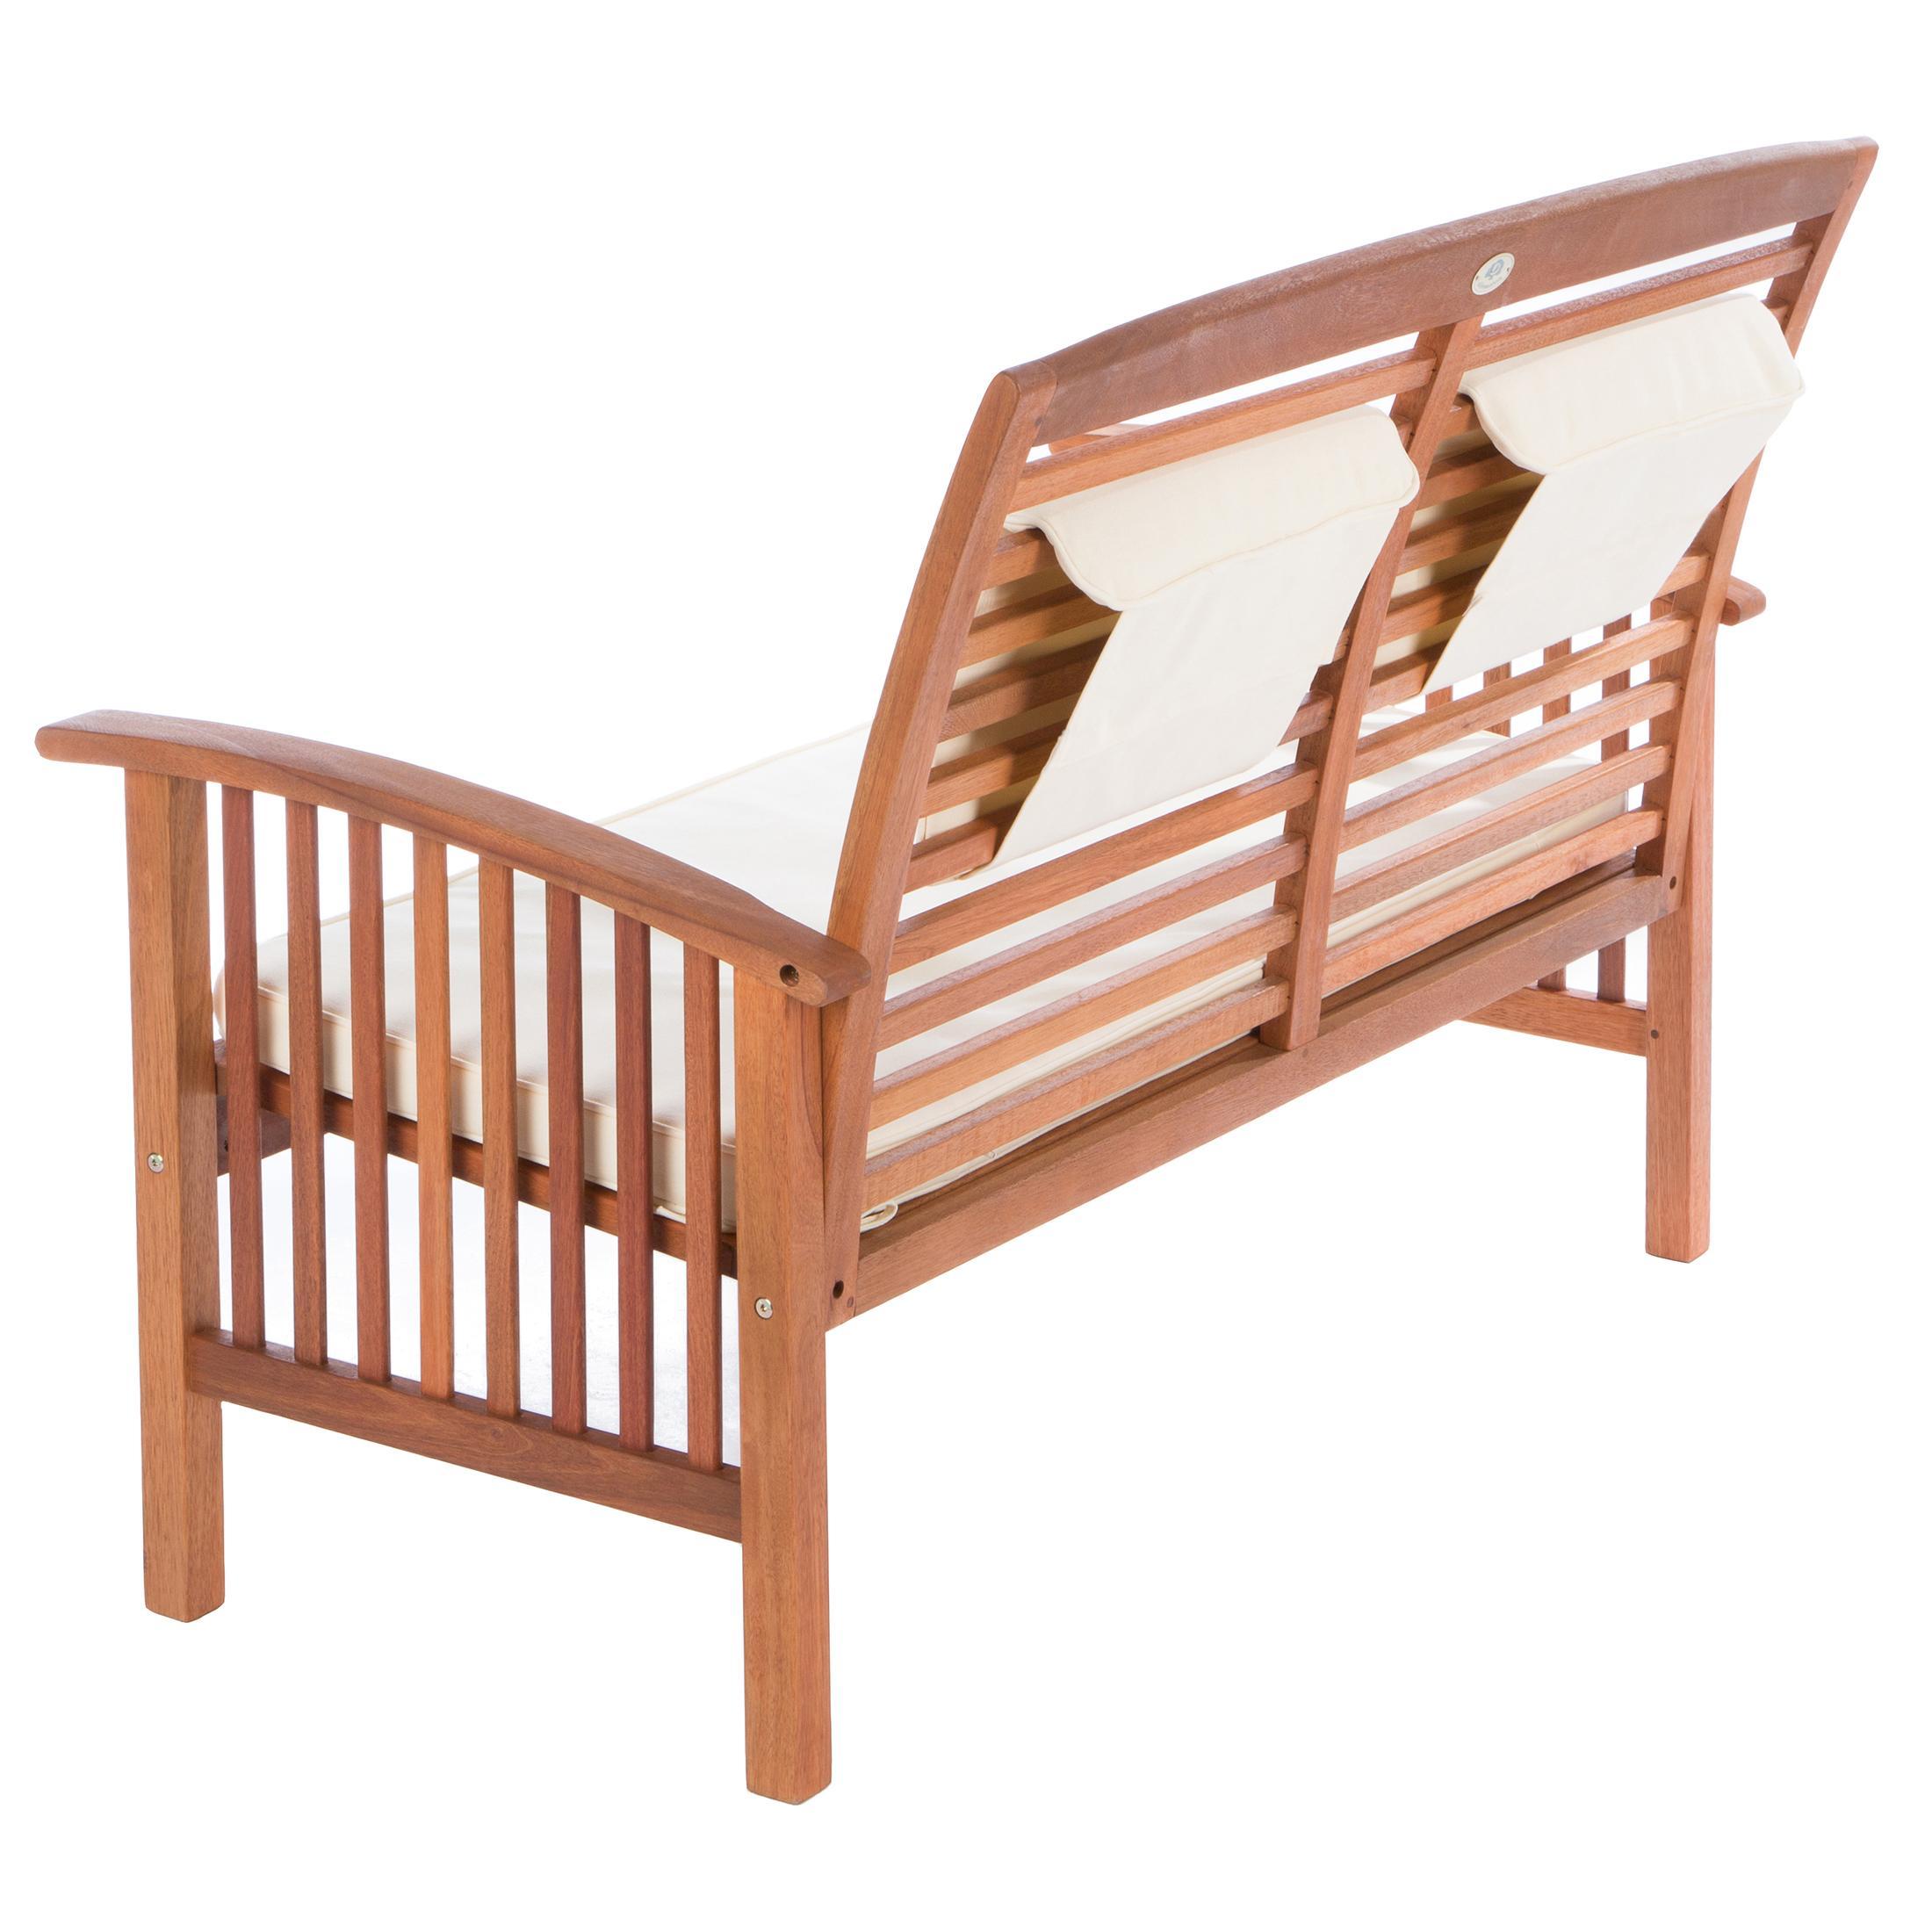 ultranatura loungebank 2 sitzer canberra serie edles hochwertiges eukalyptusholz. Black Bedroom Furniture Sets. Home Design Ideas